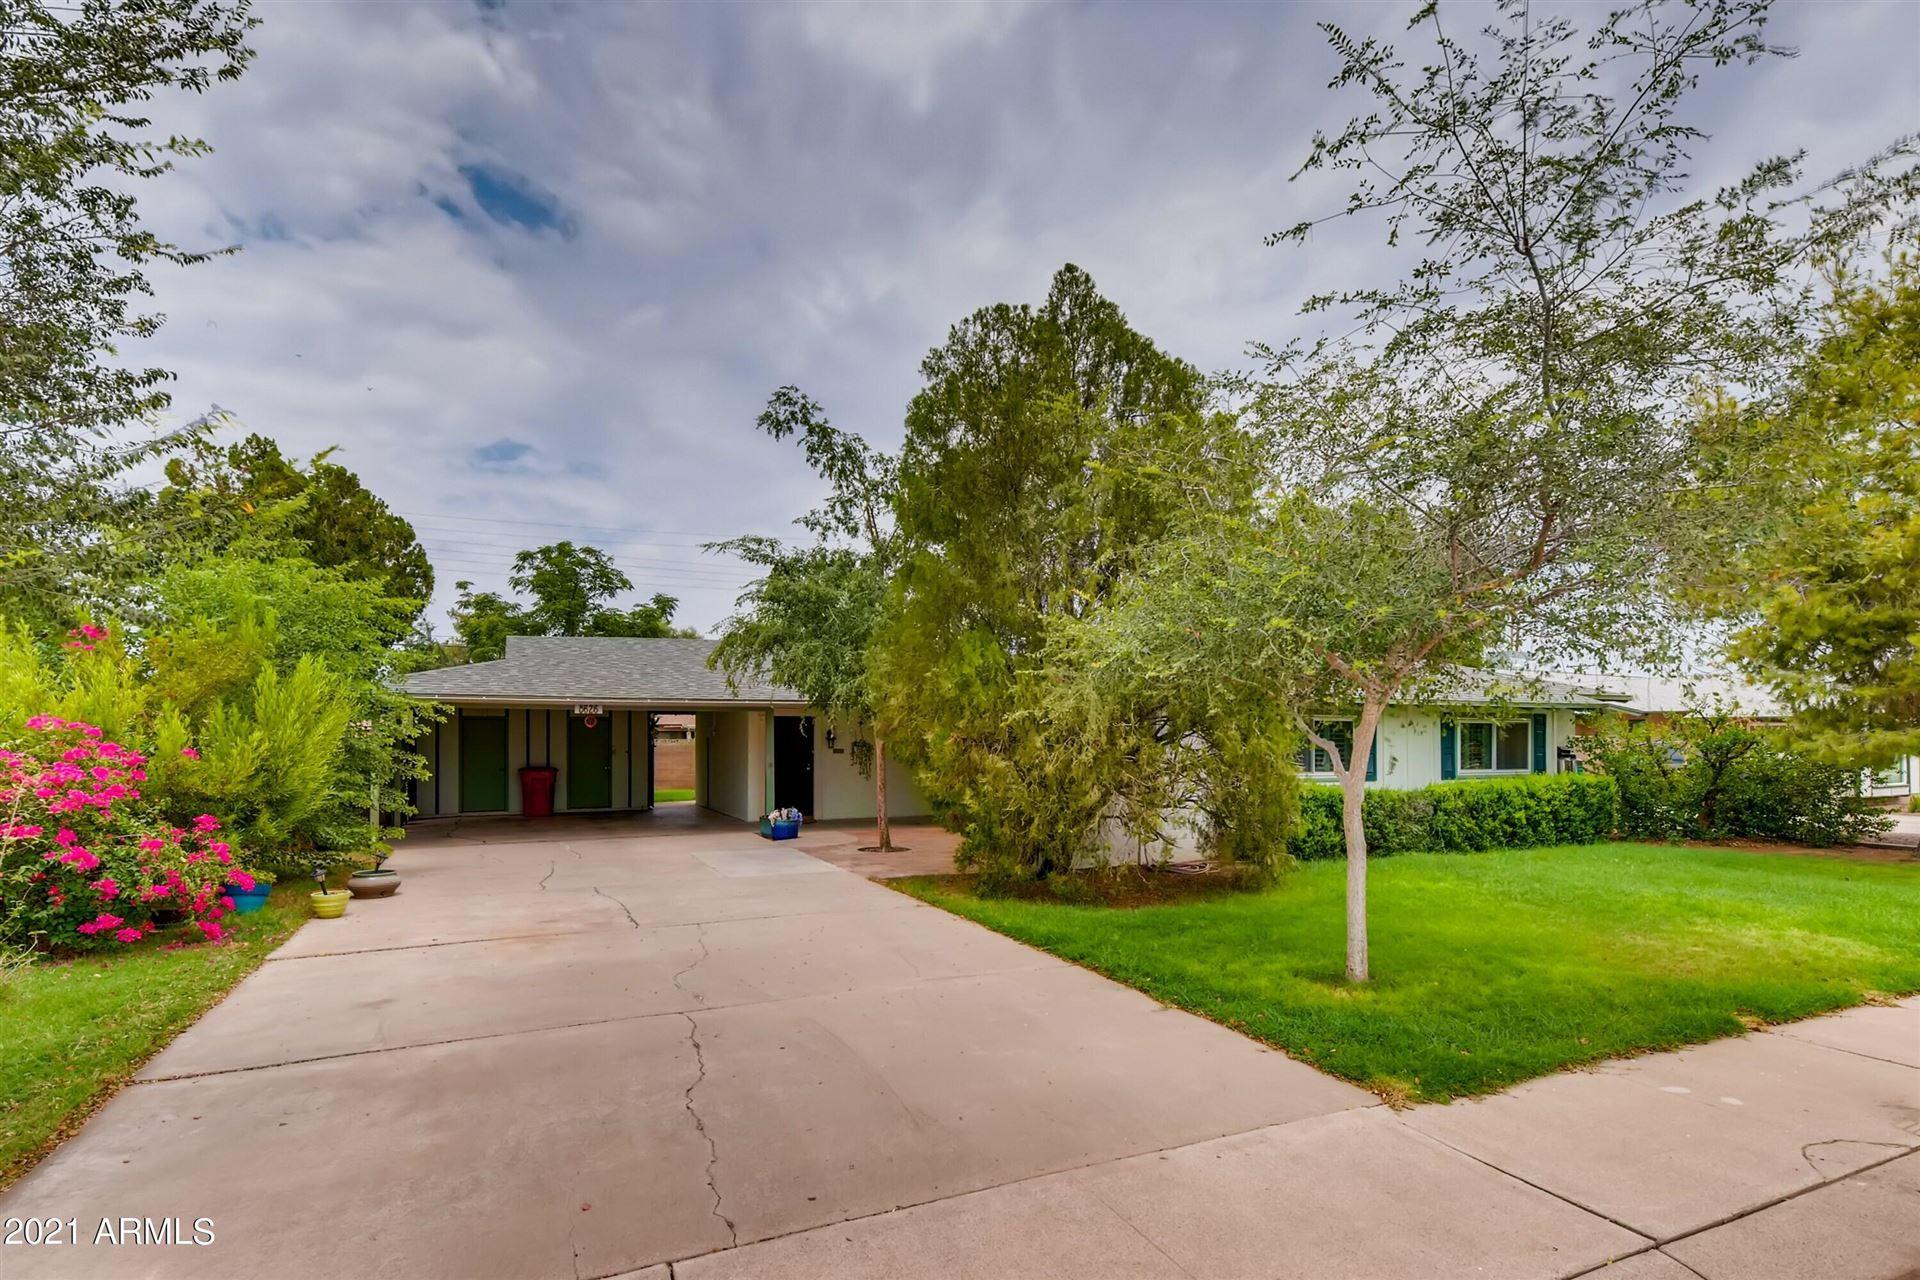 Photo of 8626 E THORNWOOD Drive, Scottsdale, AZ 85251 (MLS # 6269000)